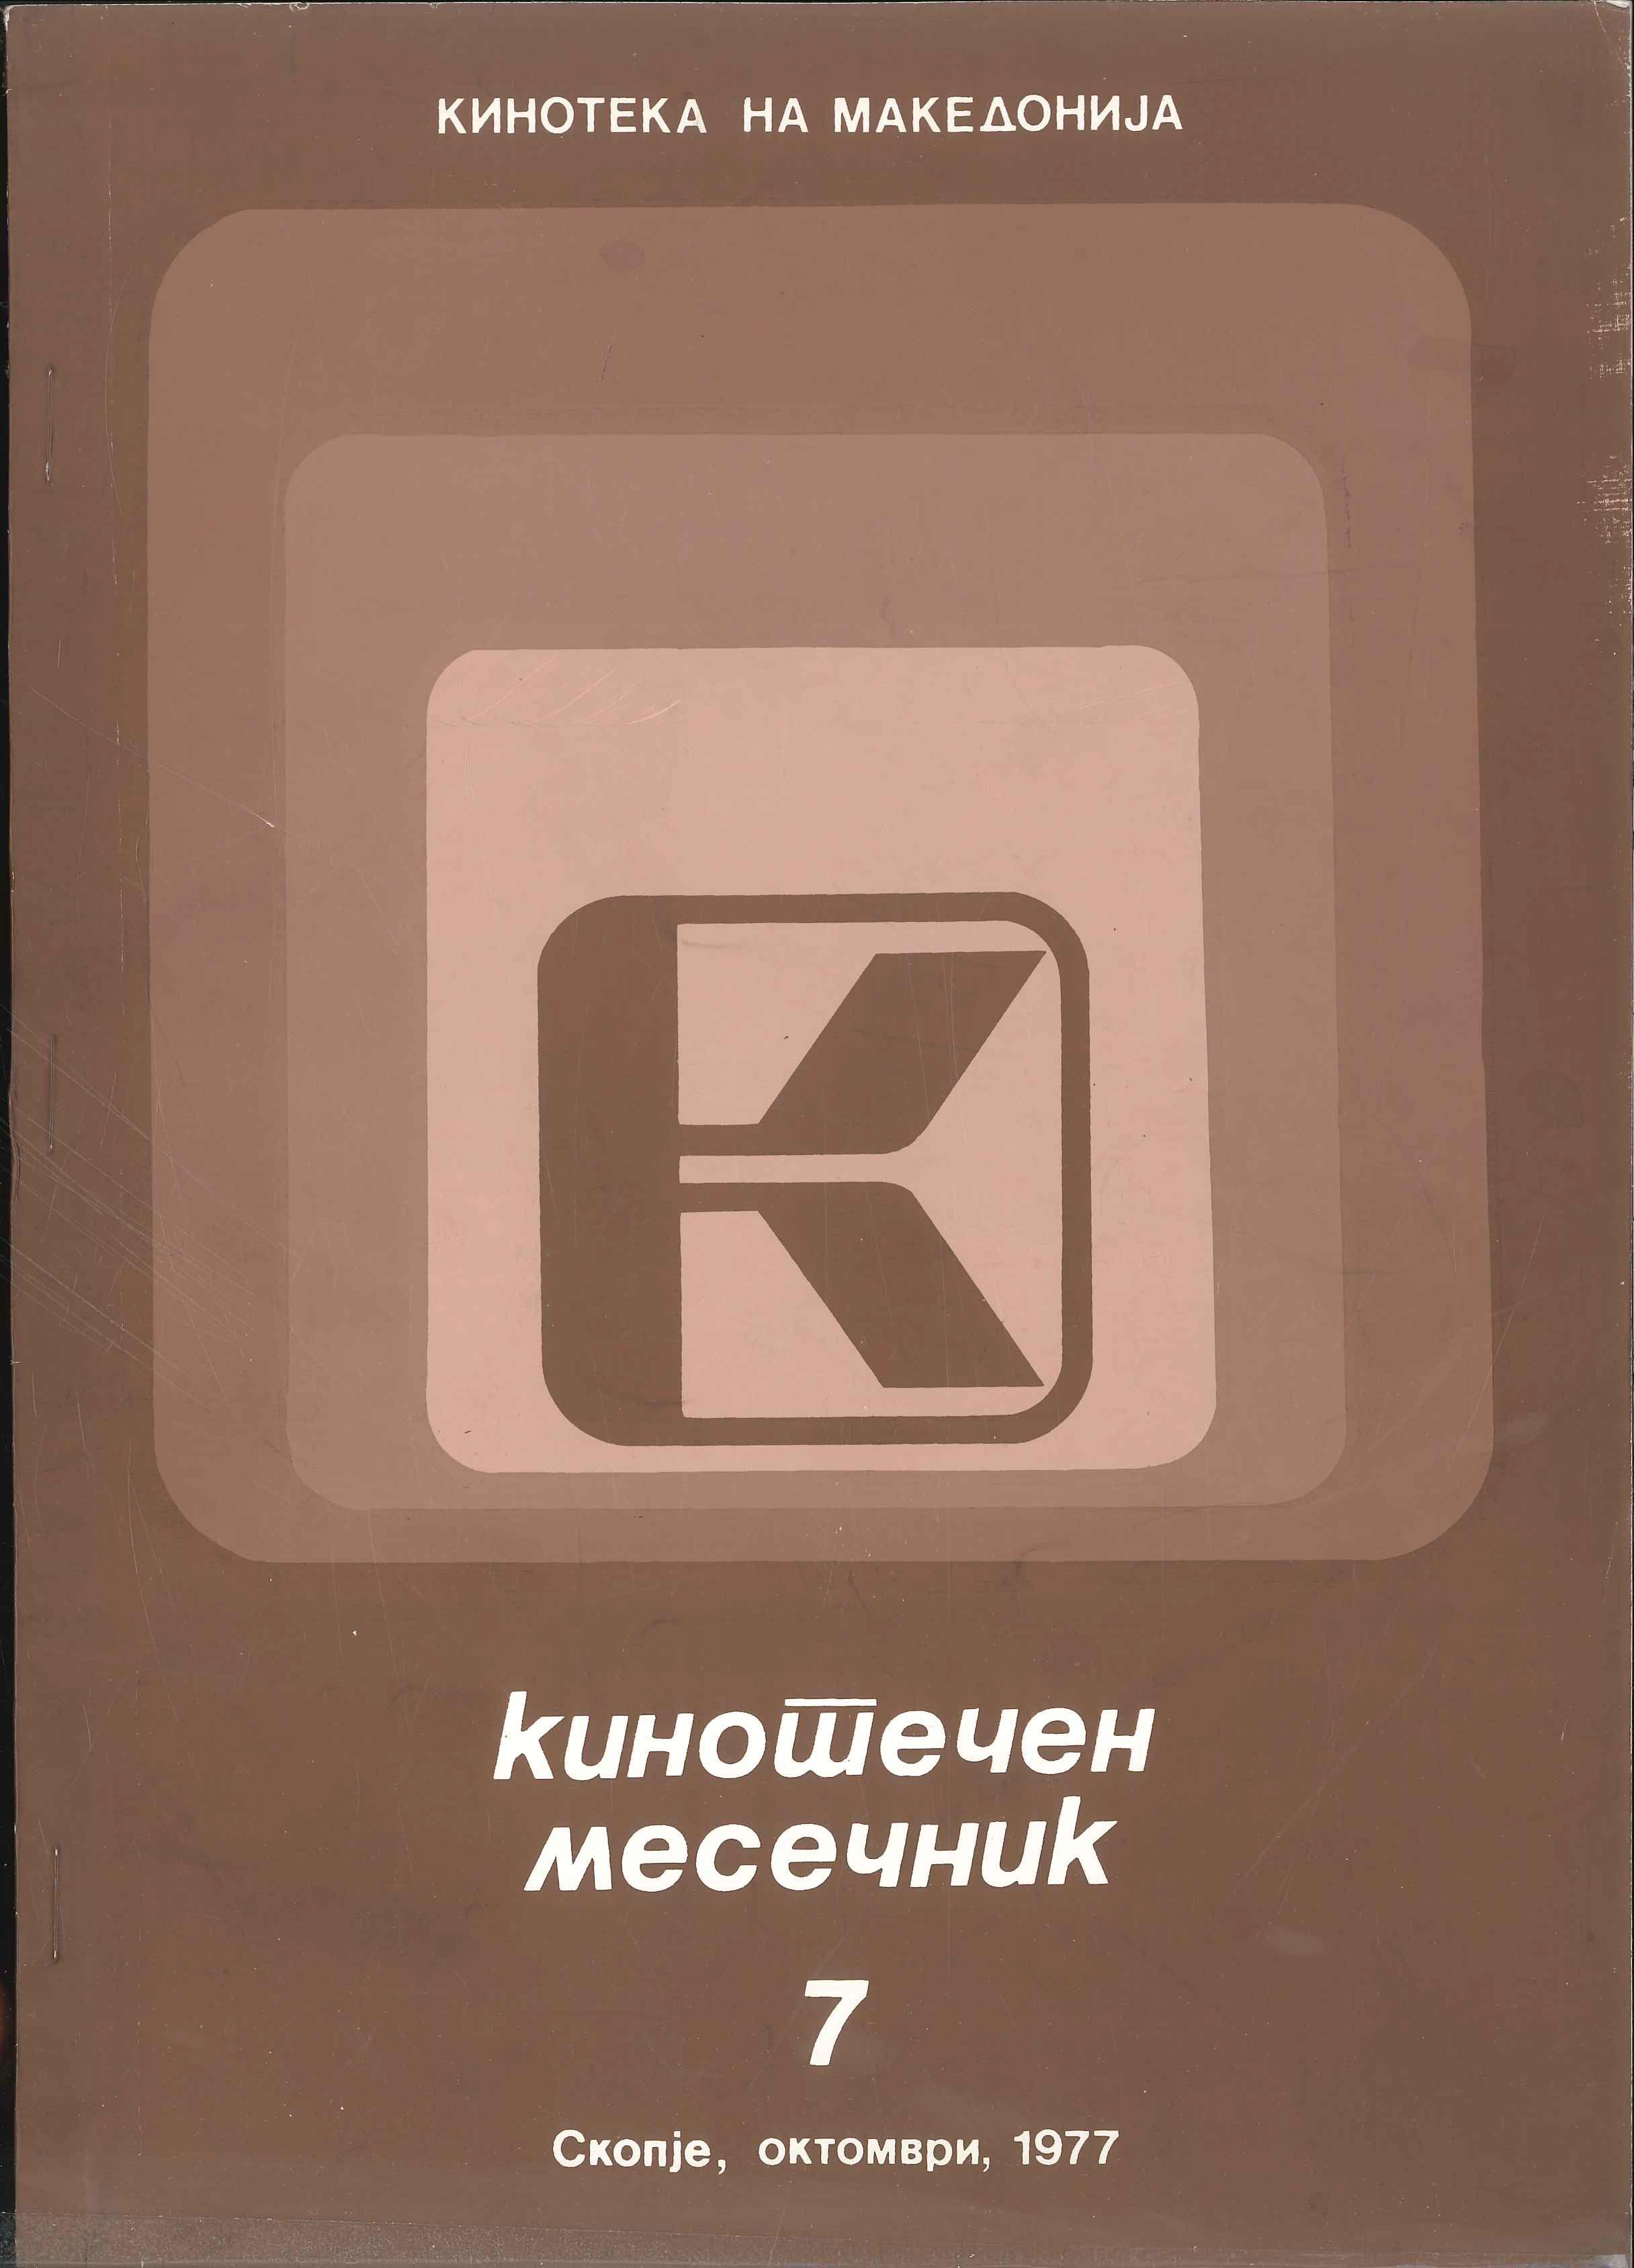 Кинотечен месечник бр. 7